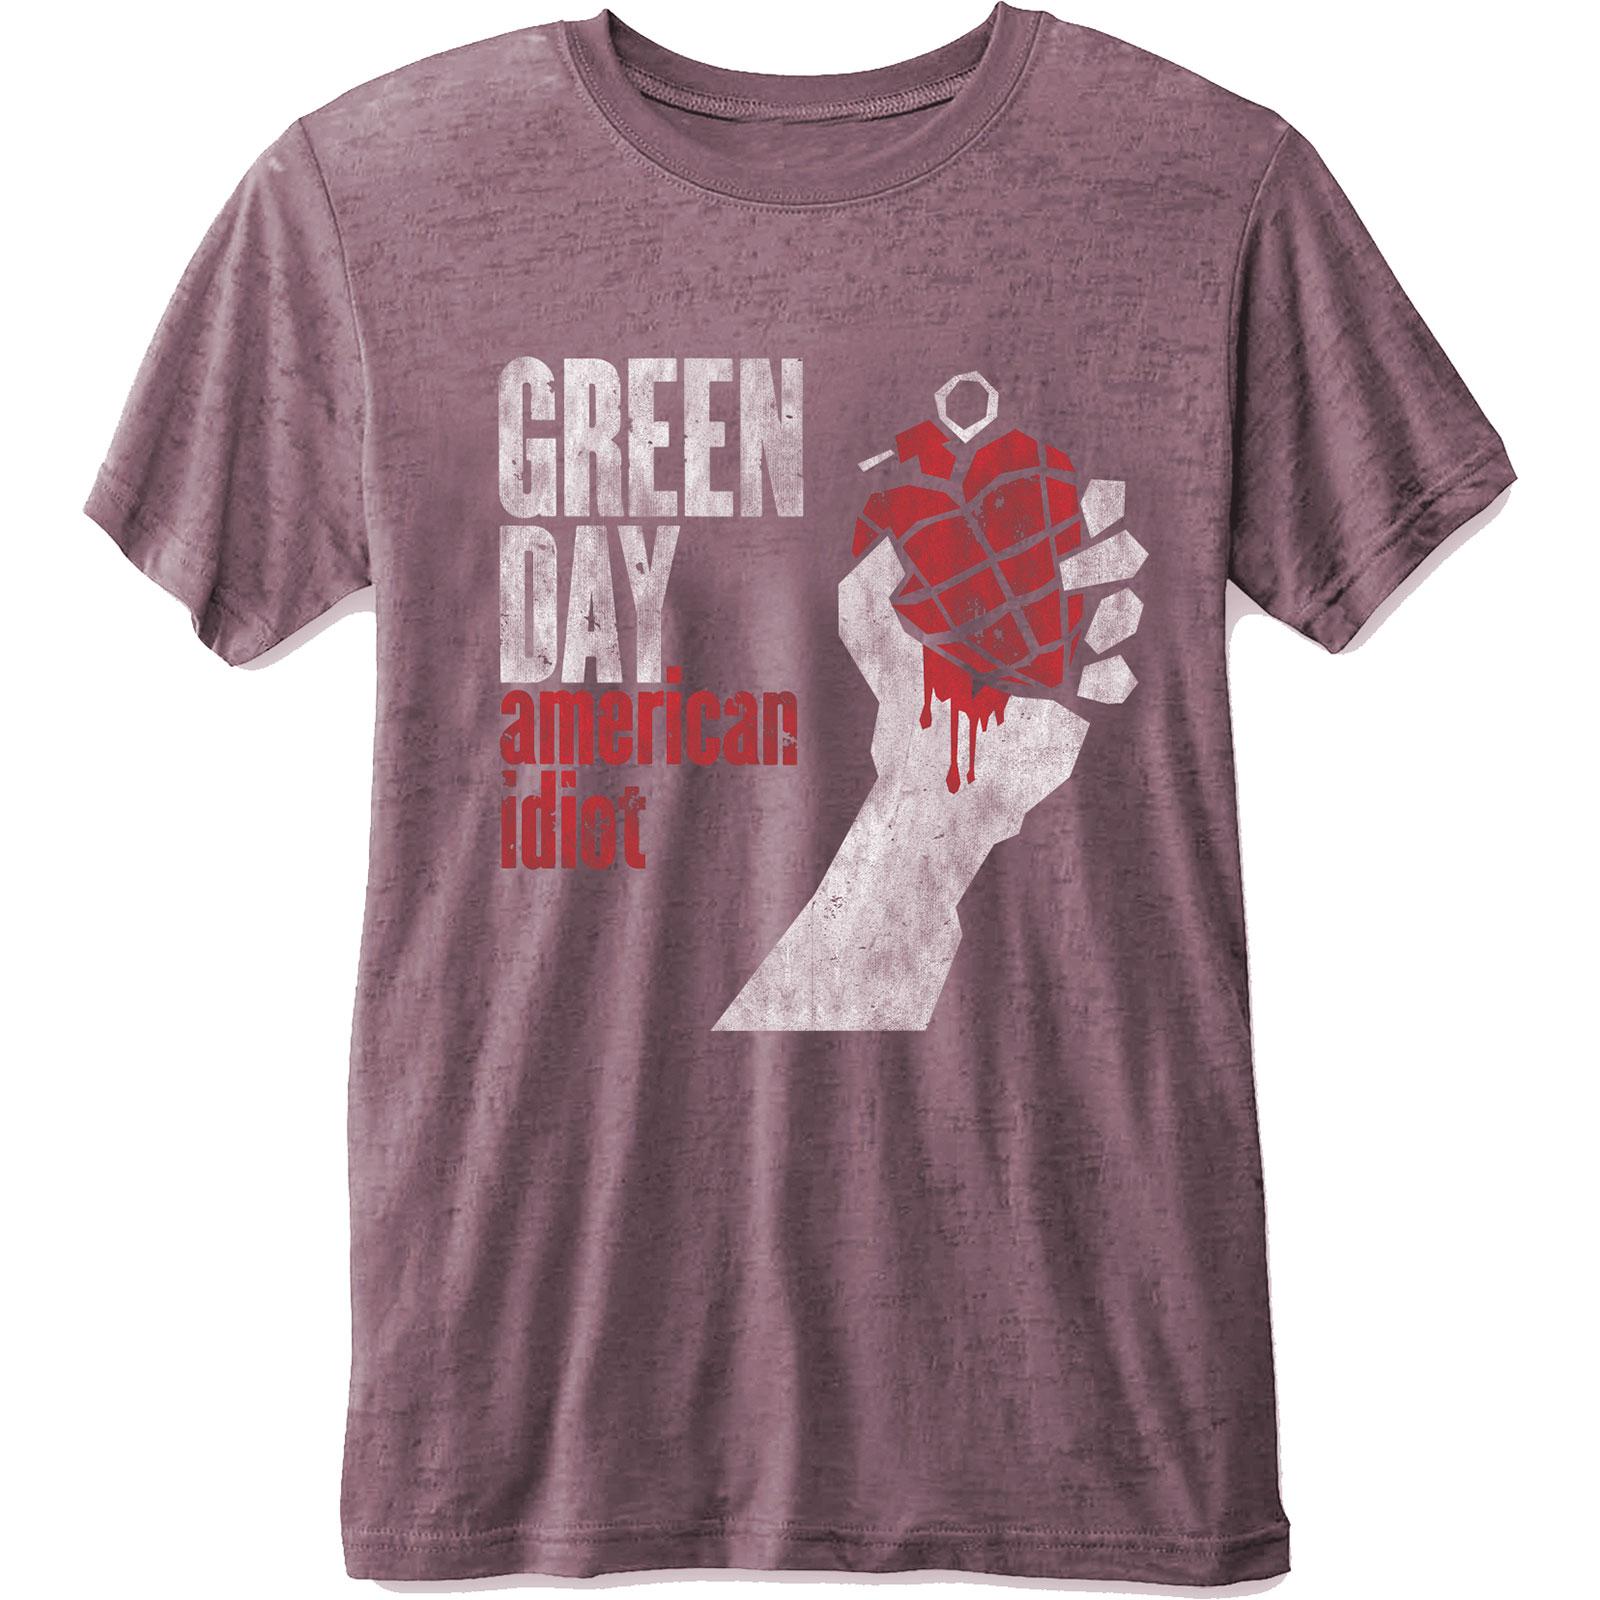 46756193a131 Pánske tričko GREEN DAY - American Idiot v SpikeStreetShop.sk